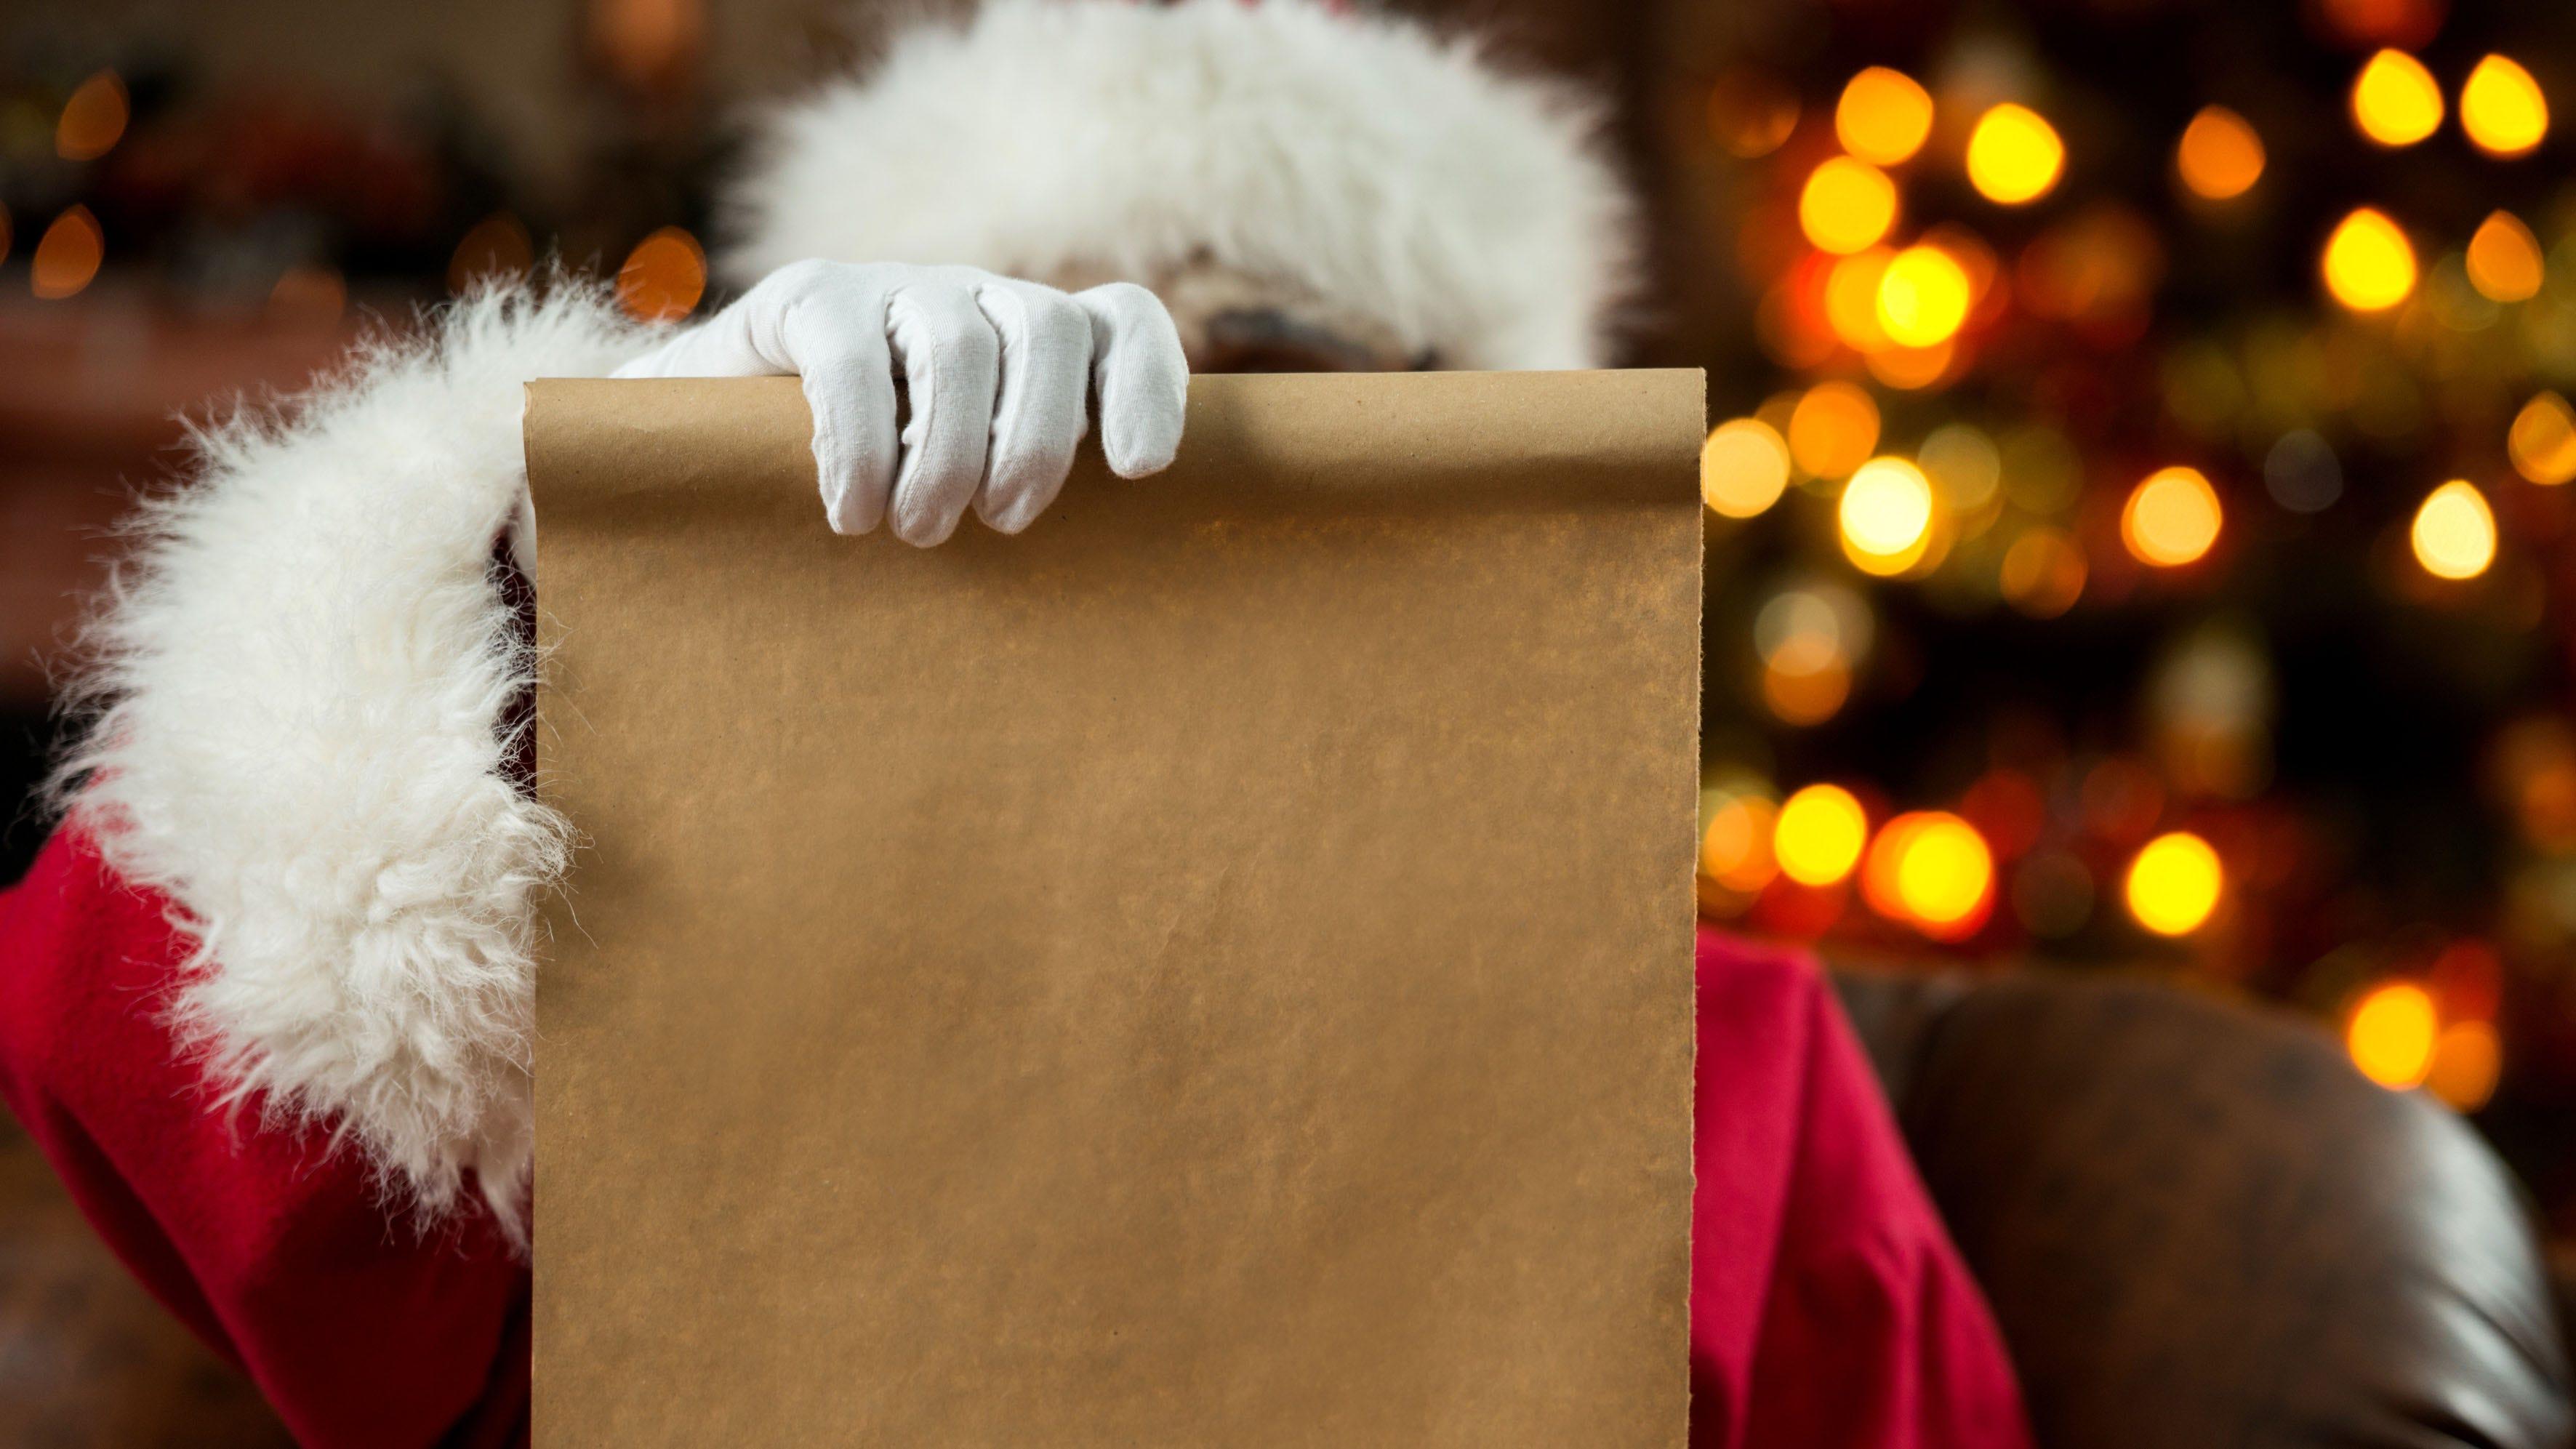 Westlake Legal Group Christmas-list 10-year-old's pricey Christmas list goes viral via Twitter Michael Hollan fox news fnc/lifestyle fnc cf81263e-6a09-5f79-b989-dd407b82b6ec article /FOX NEWS/LIFESTYLE/OCCASIONS/Holiday